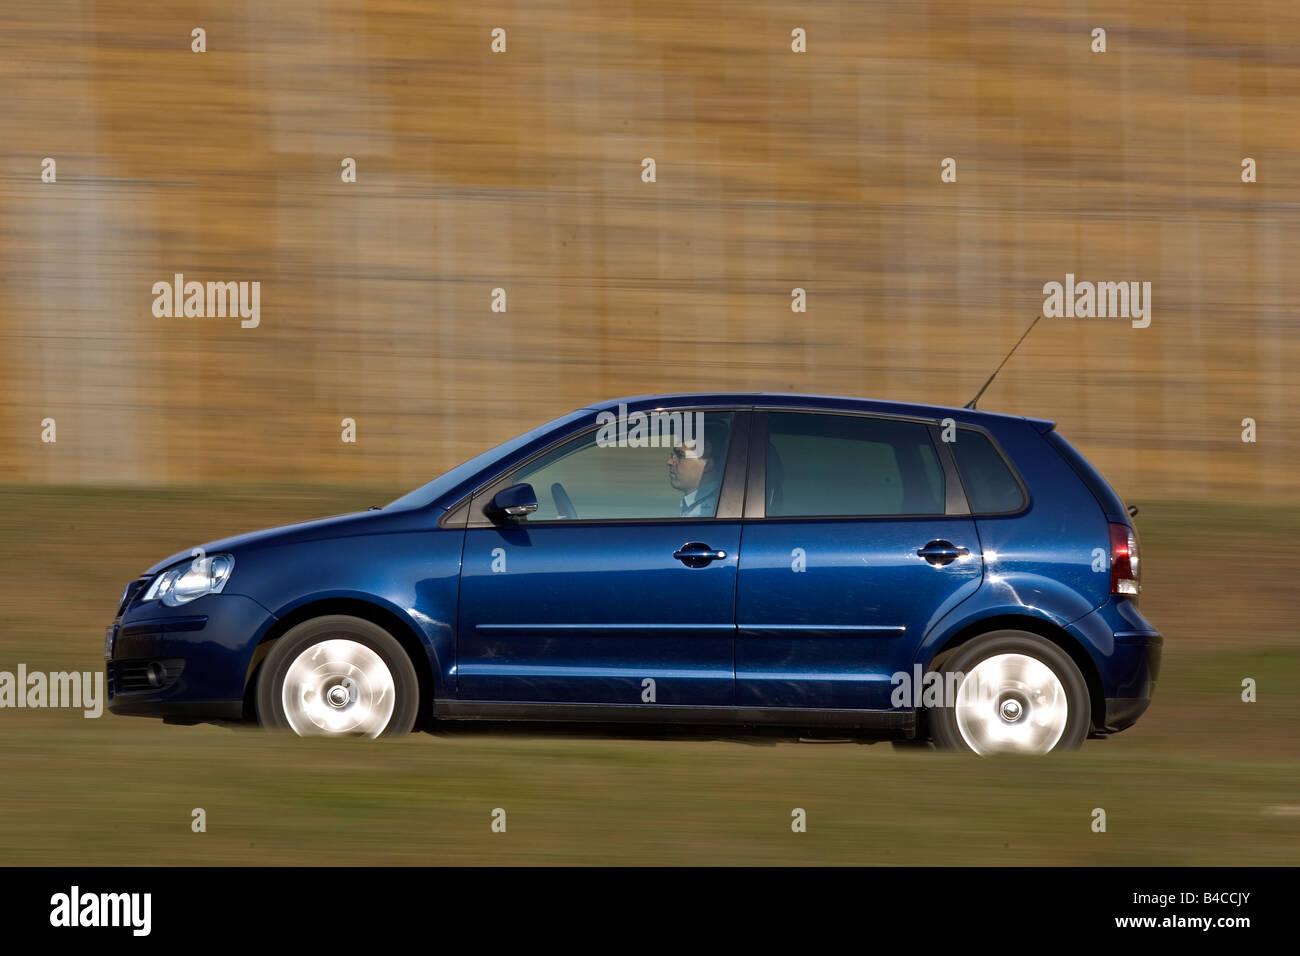 Car Vw Volkswagen Polo 1 9 Tdi Model Year 2005 Dark